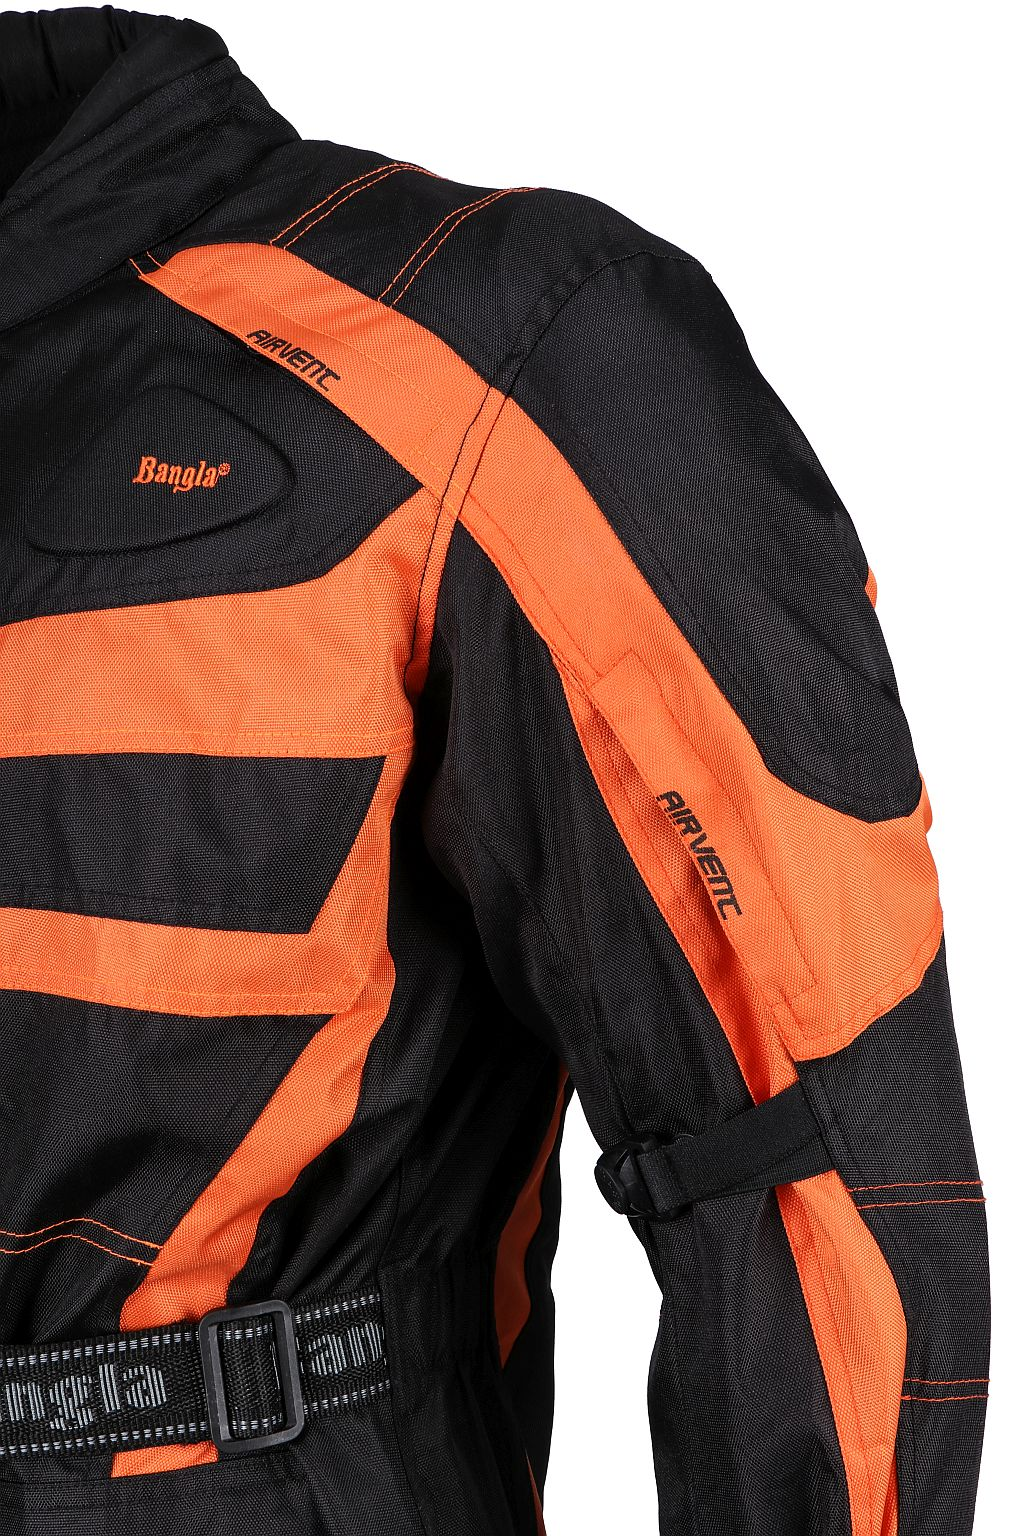 Bangla Kinder Motorrad Textil Jacke Cordura schwarz orange  128 - 176